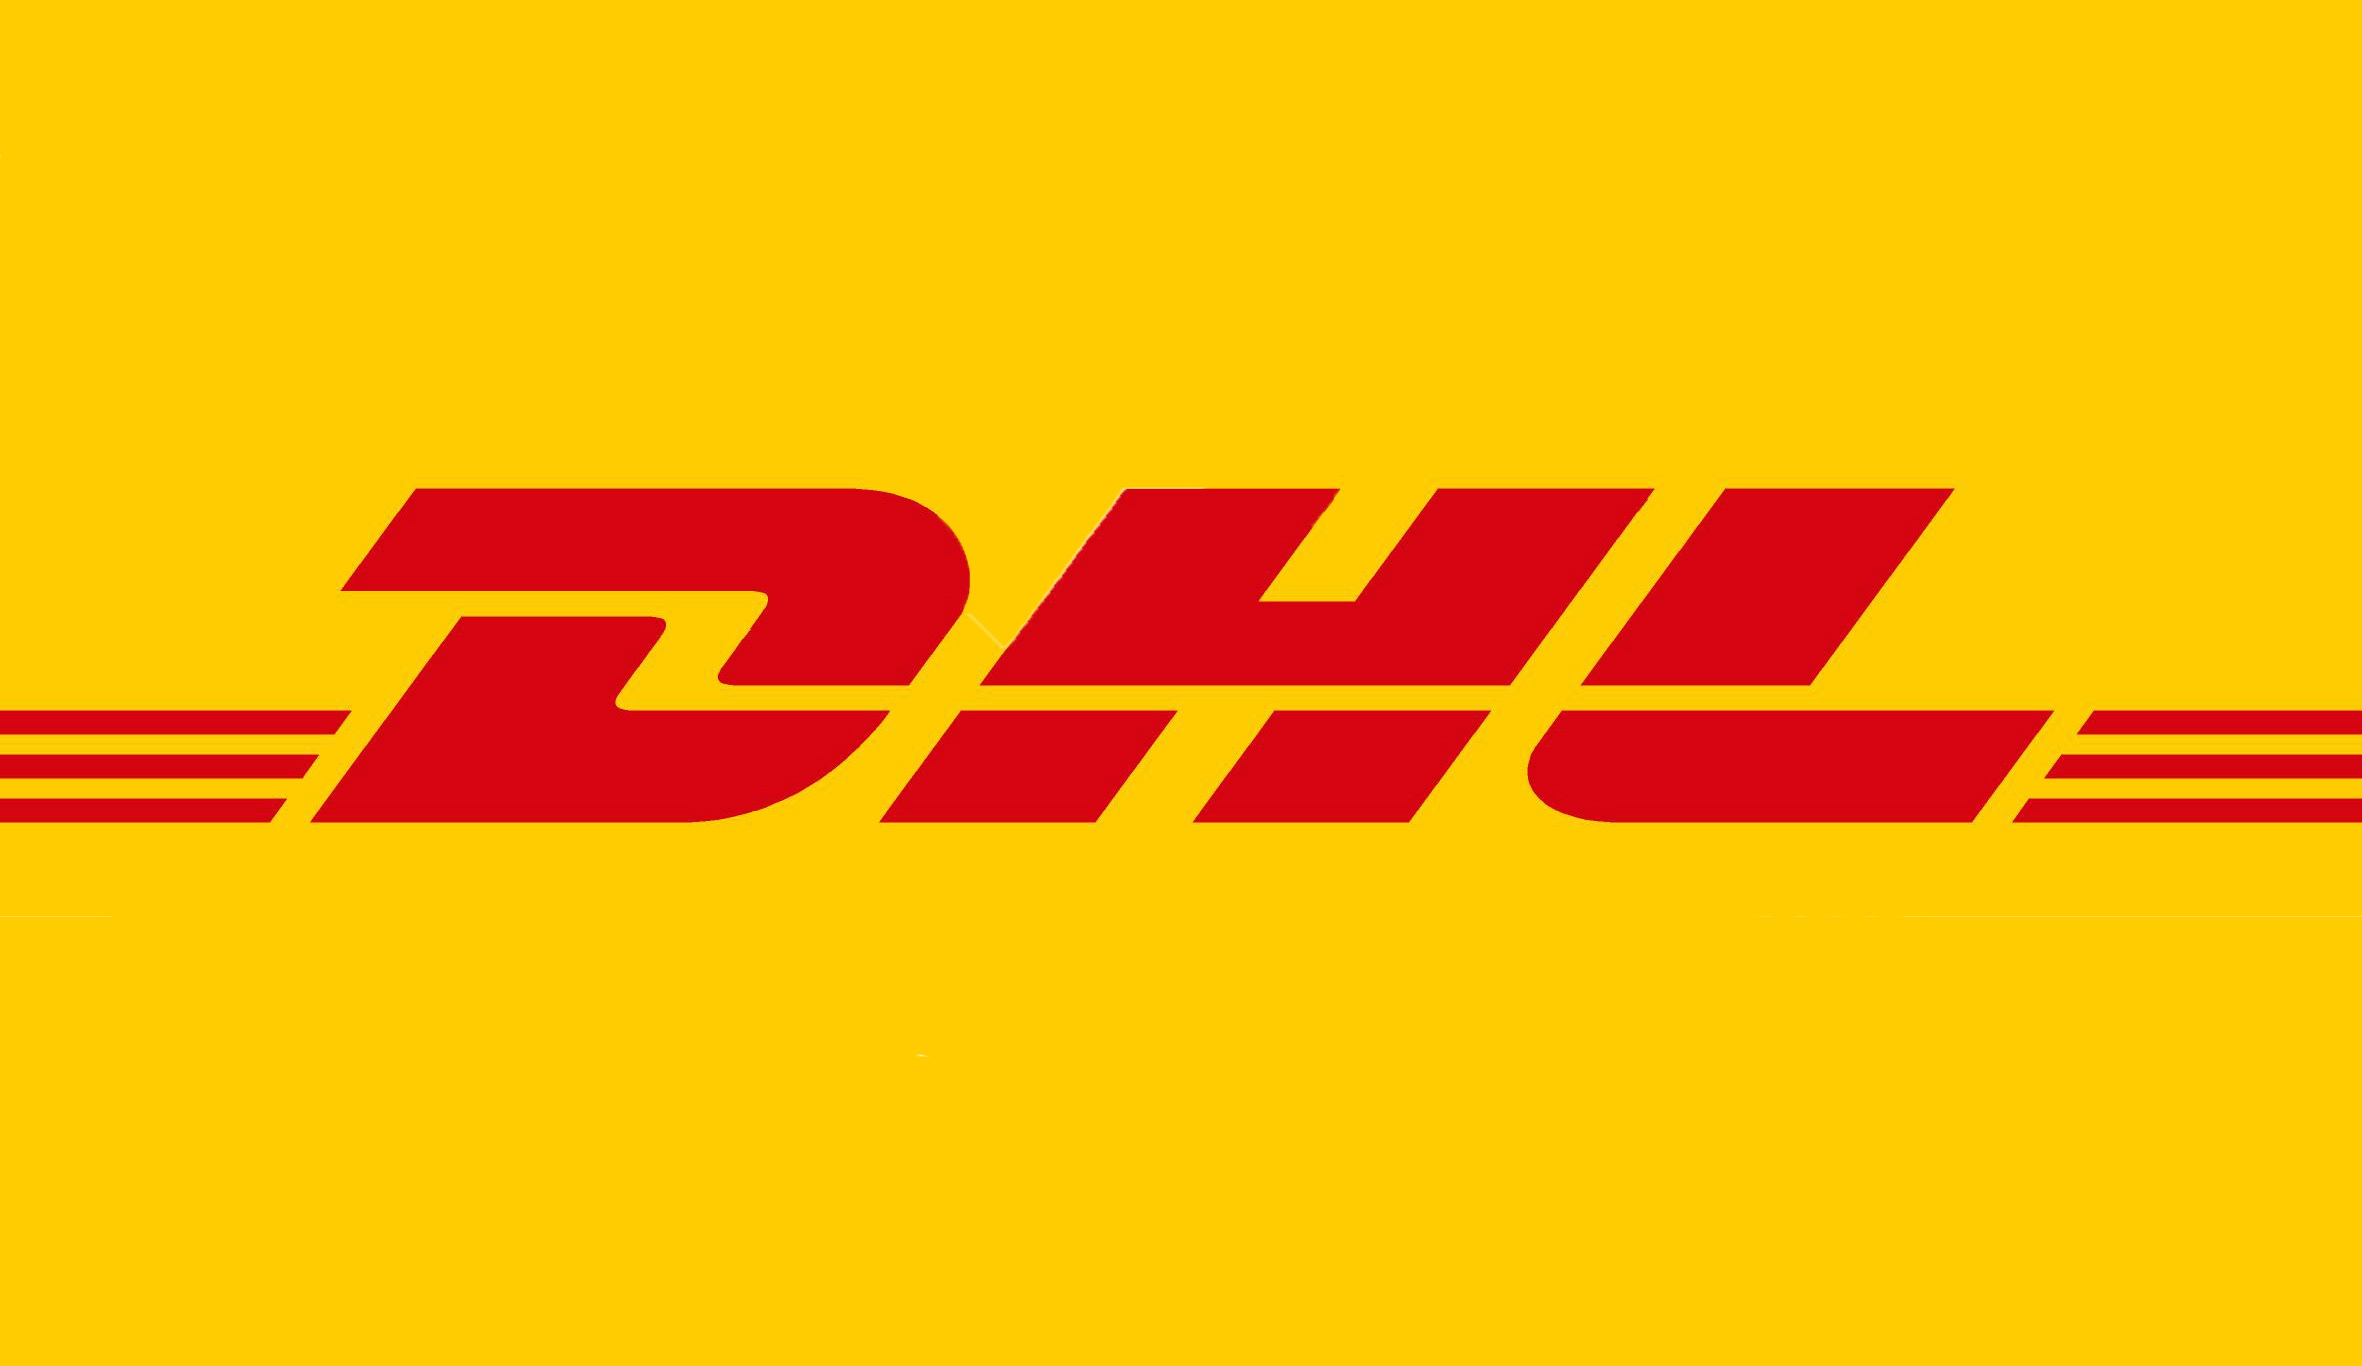 DHL Express - 3302